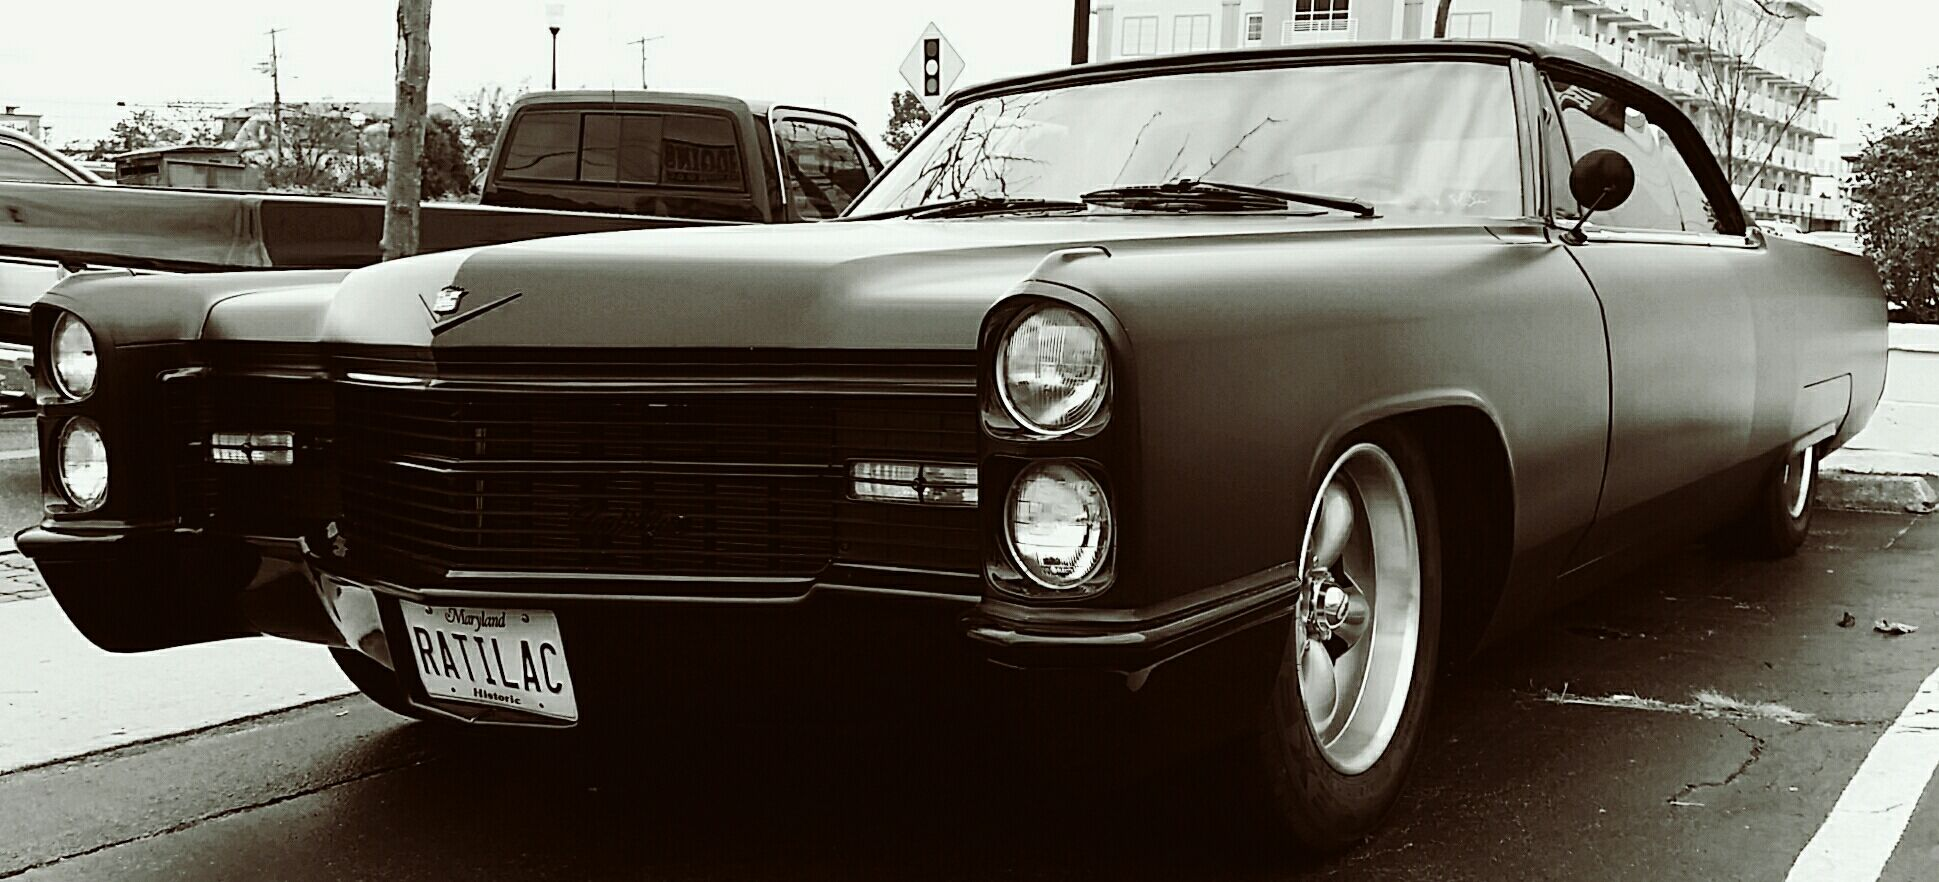 Ratilac, a classic Caddy   Classic Cars   Vintage Automobiles ...